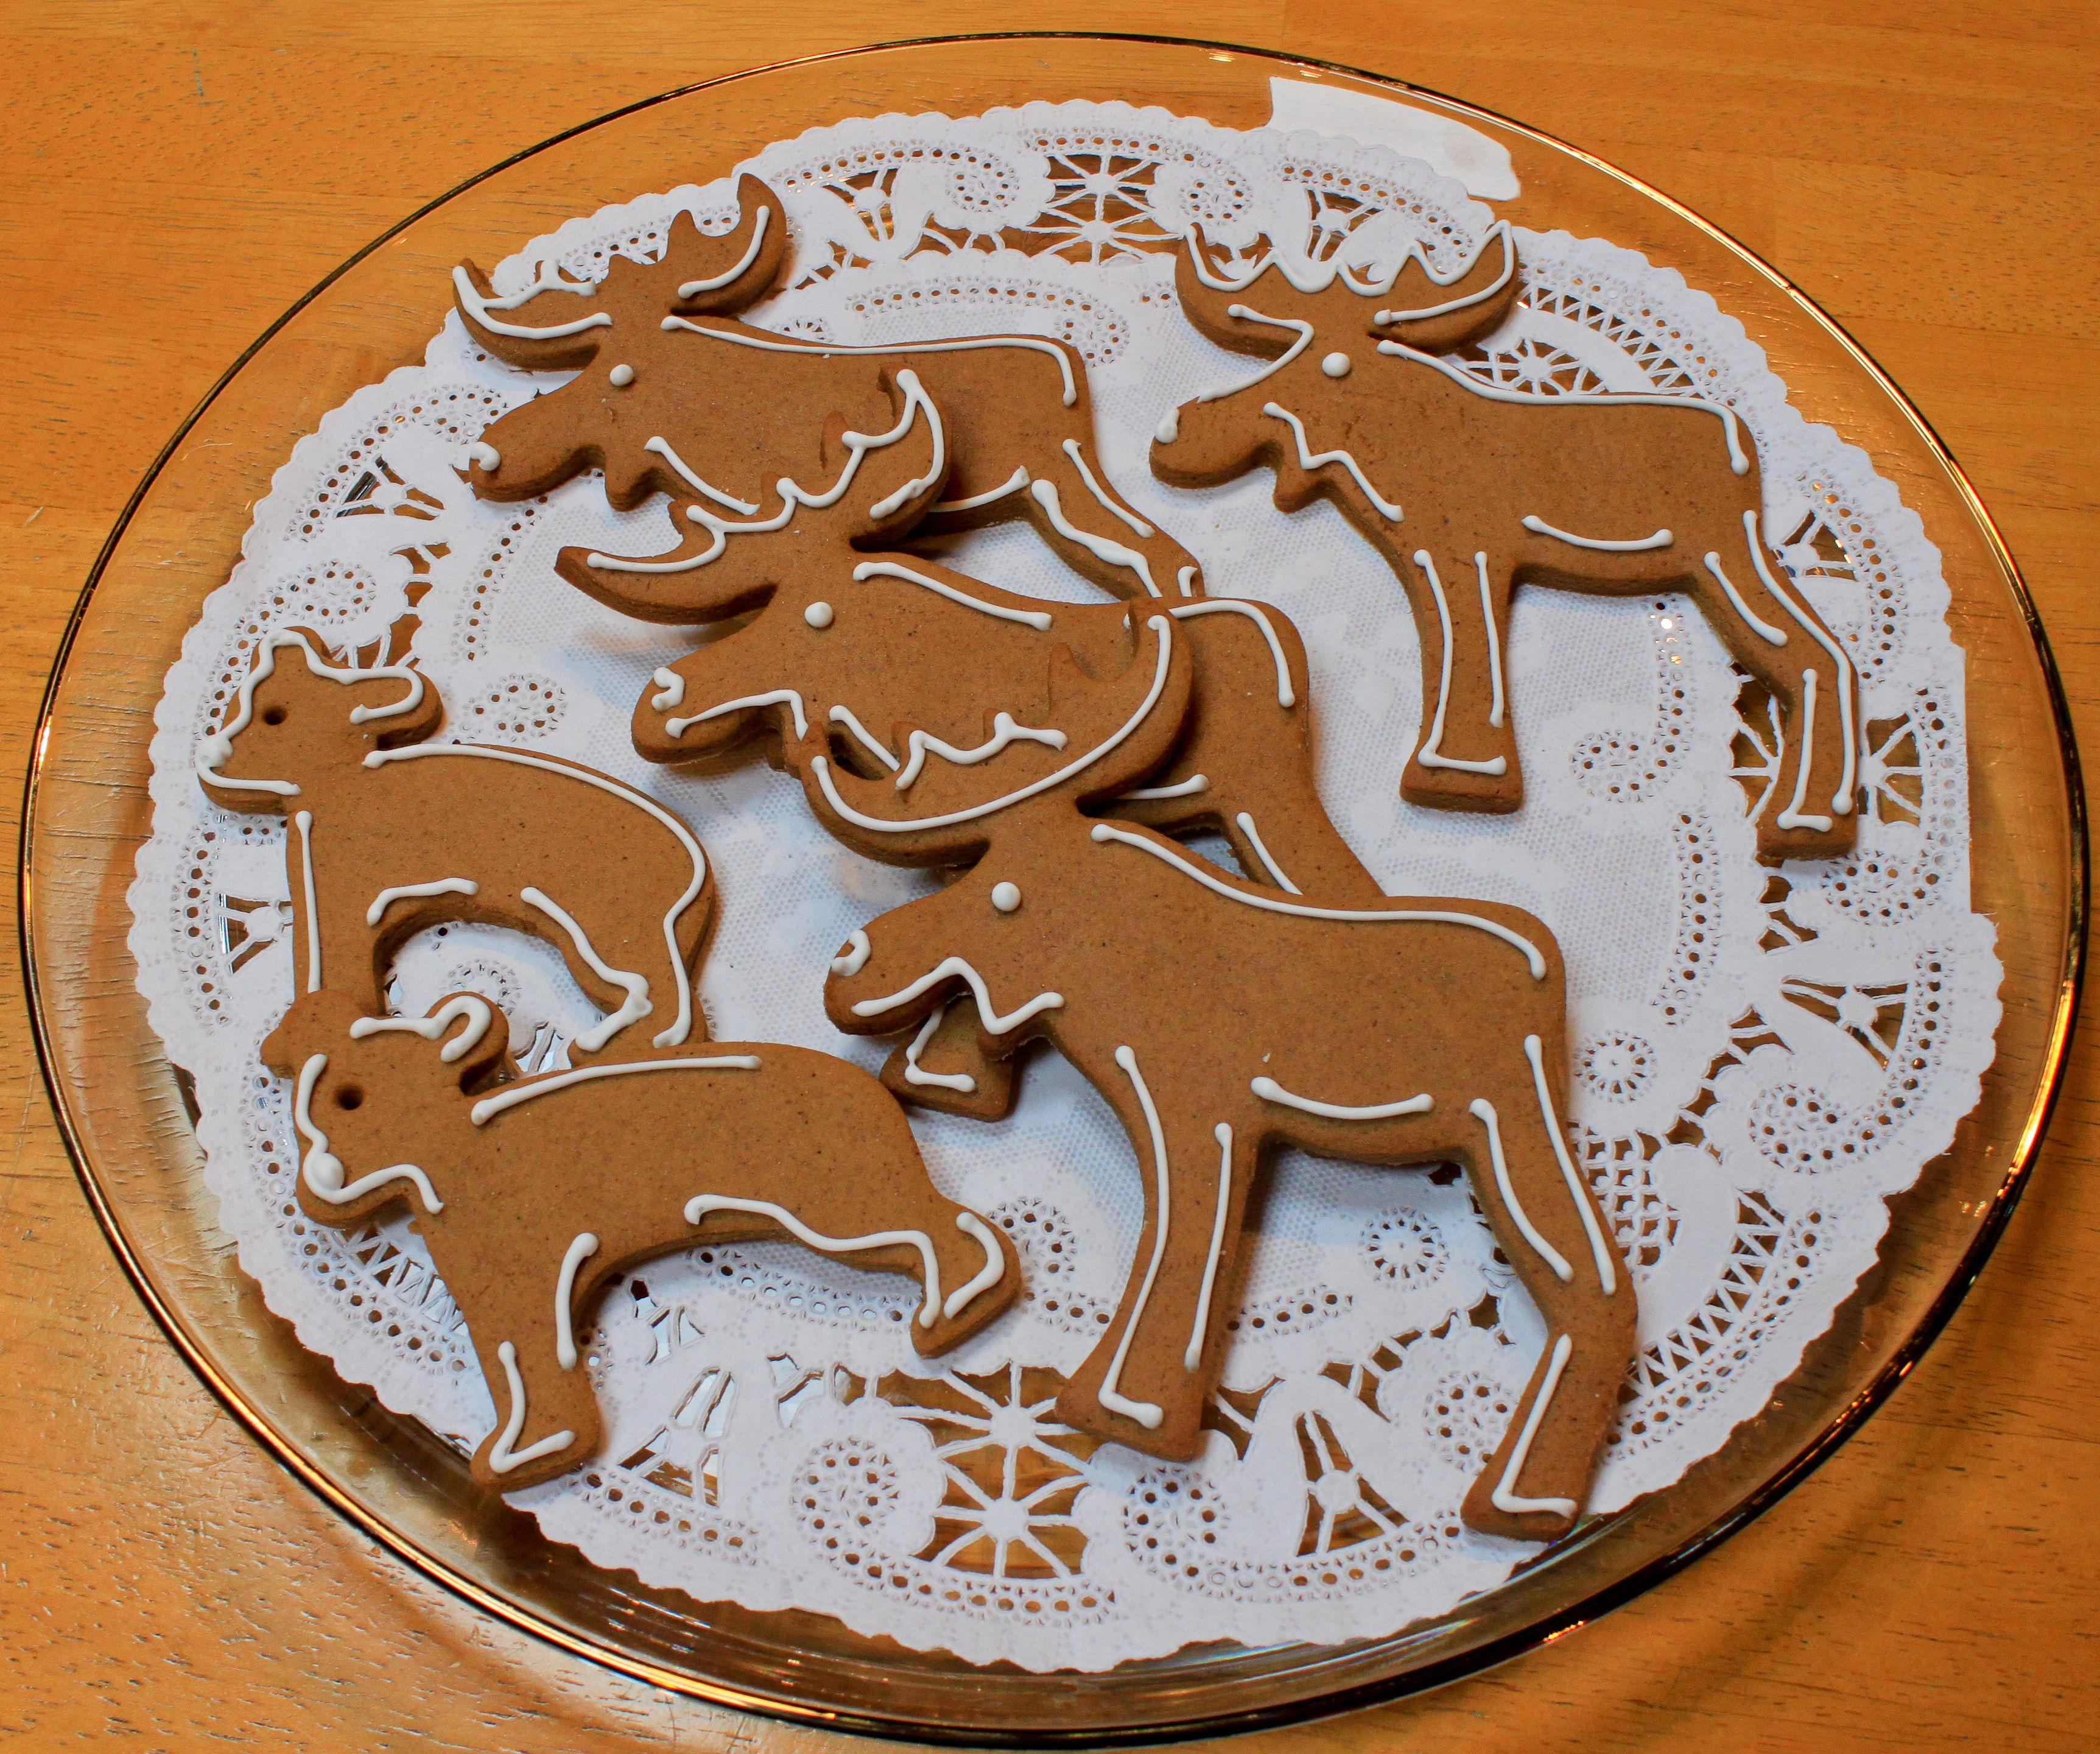 Gingerbread Ikea Cookie Cutter Animal Cookies Dec 2013 Robin S